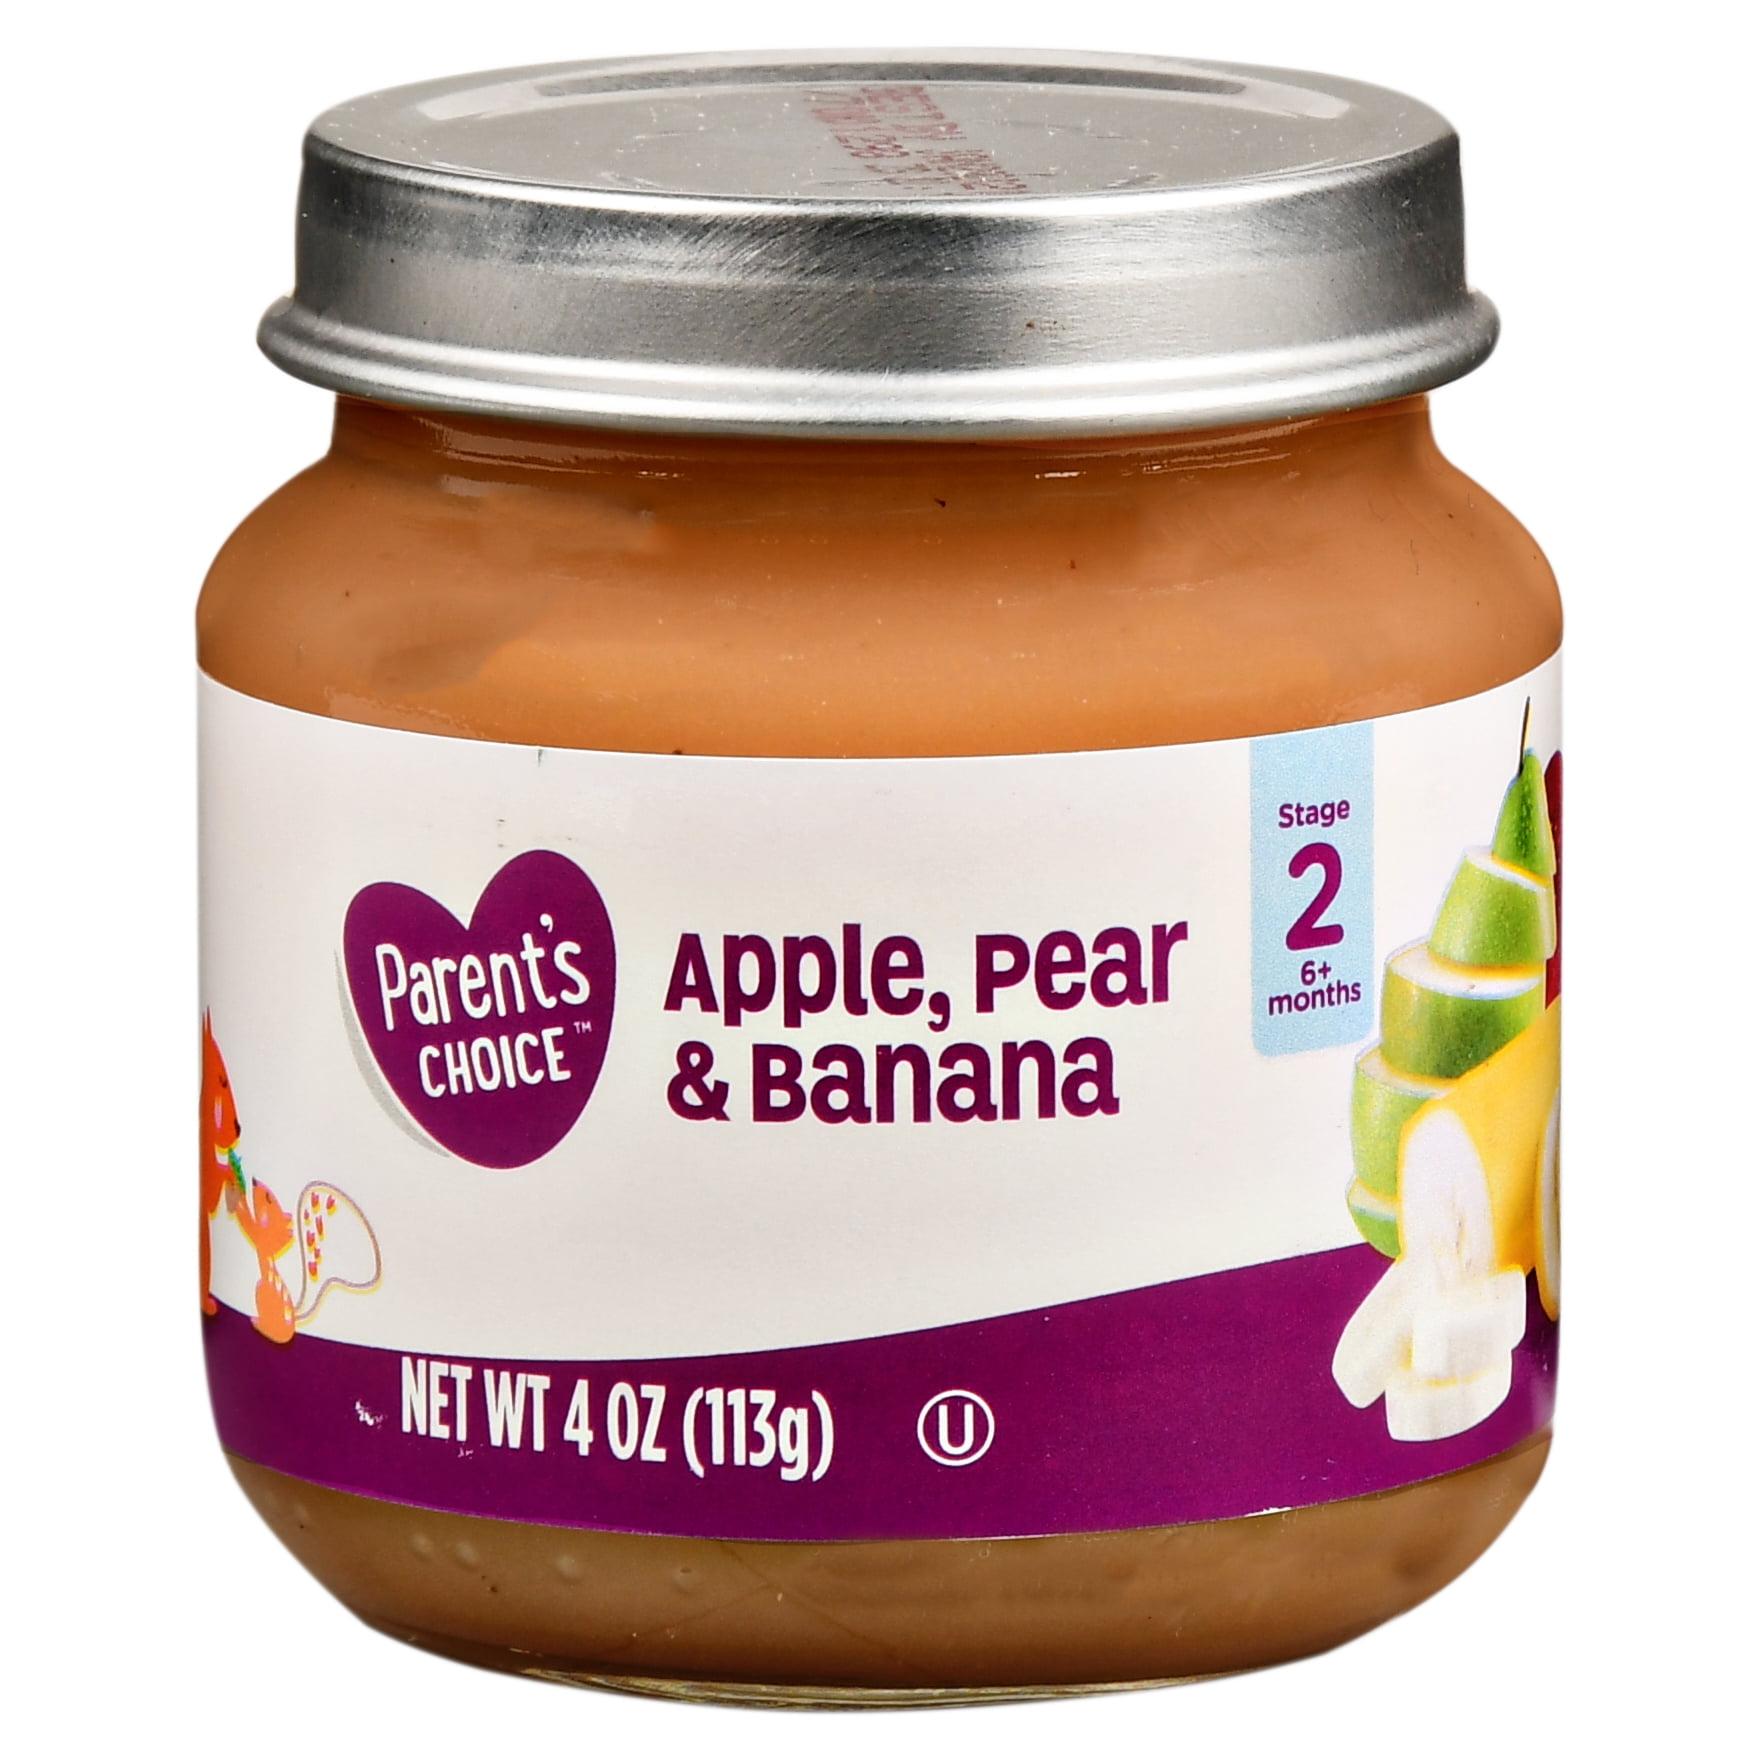 Parent's Choice Baby Food, Apple, Pear & Banana, Stage 2, 4 oz